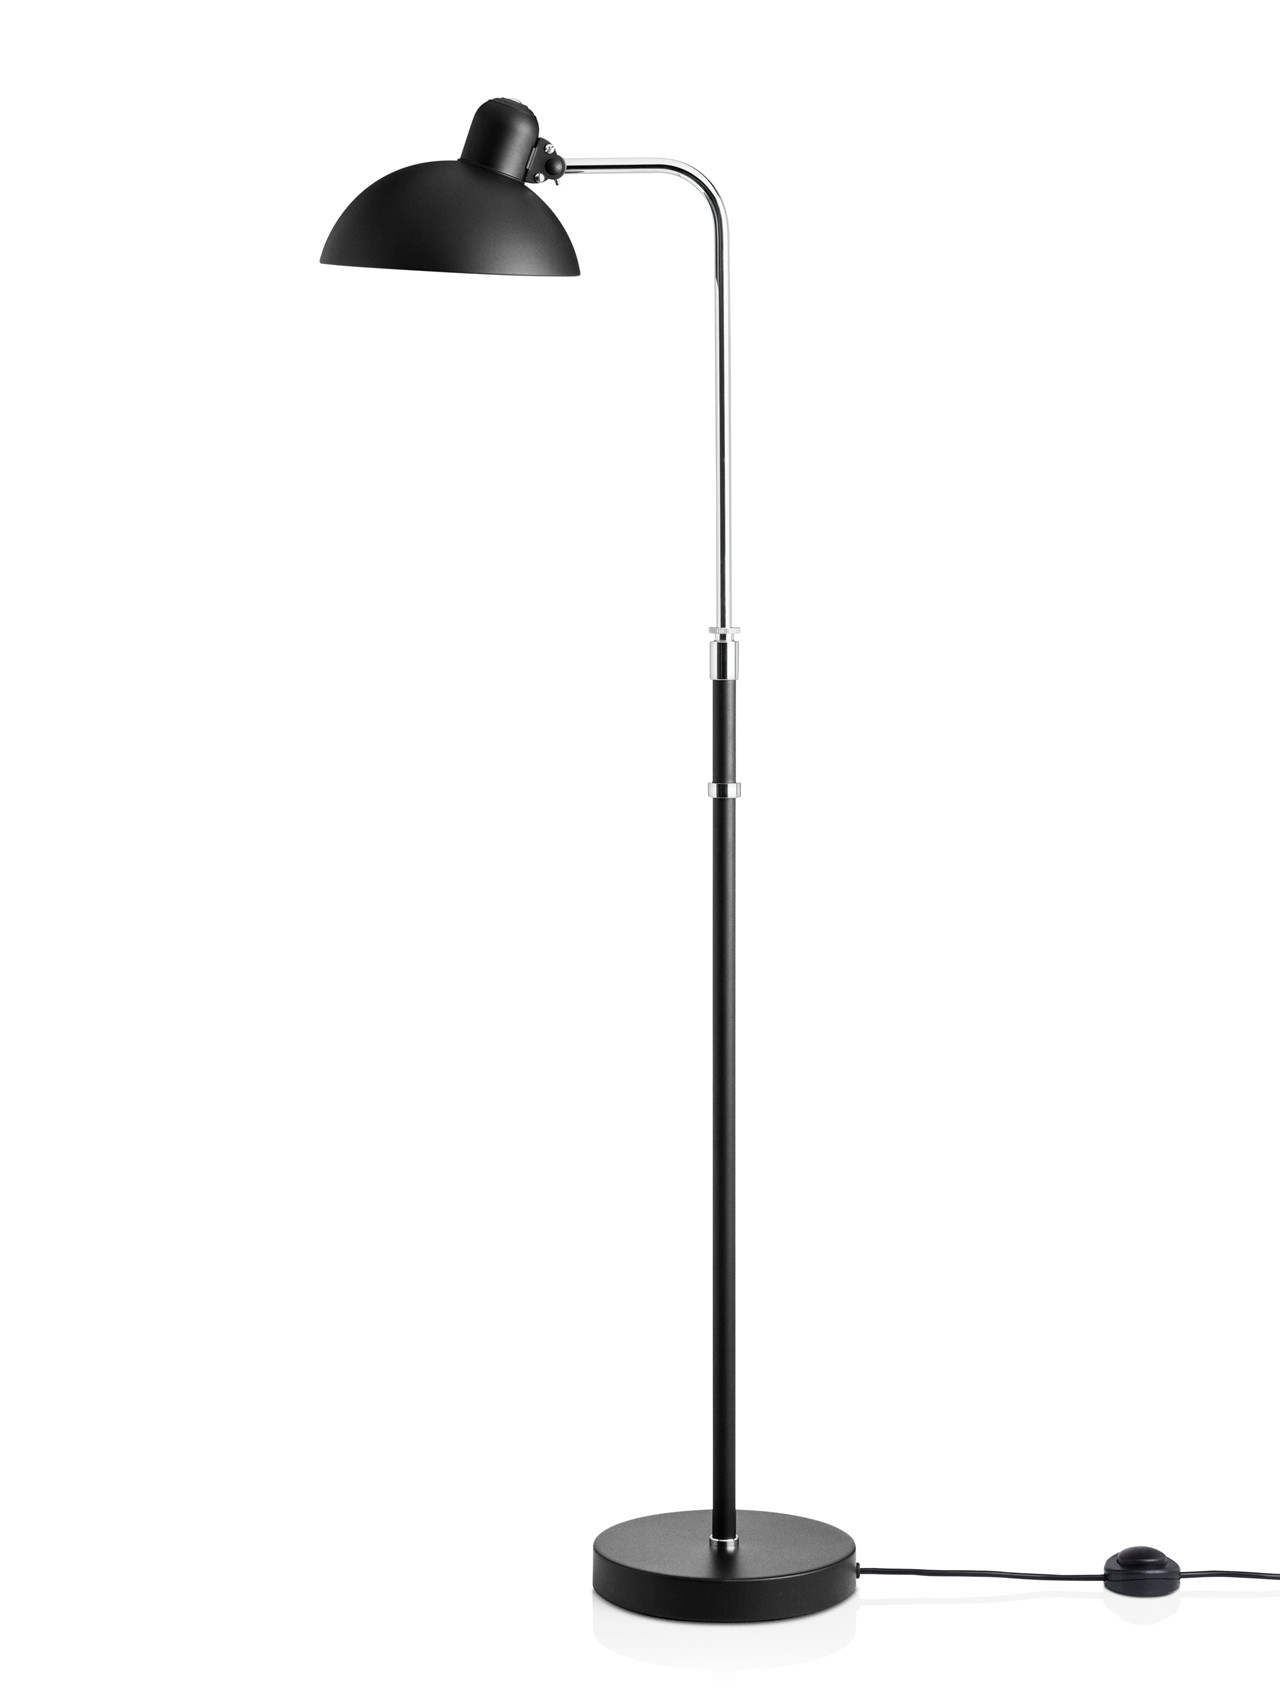 standerlampe design Kaiser Idell standerlampe | Køb Kaiser Idell gulvlamper her standerlampe design